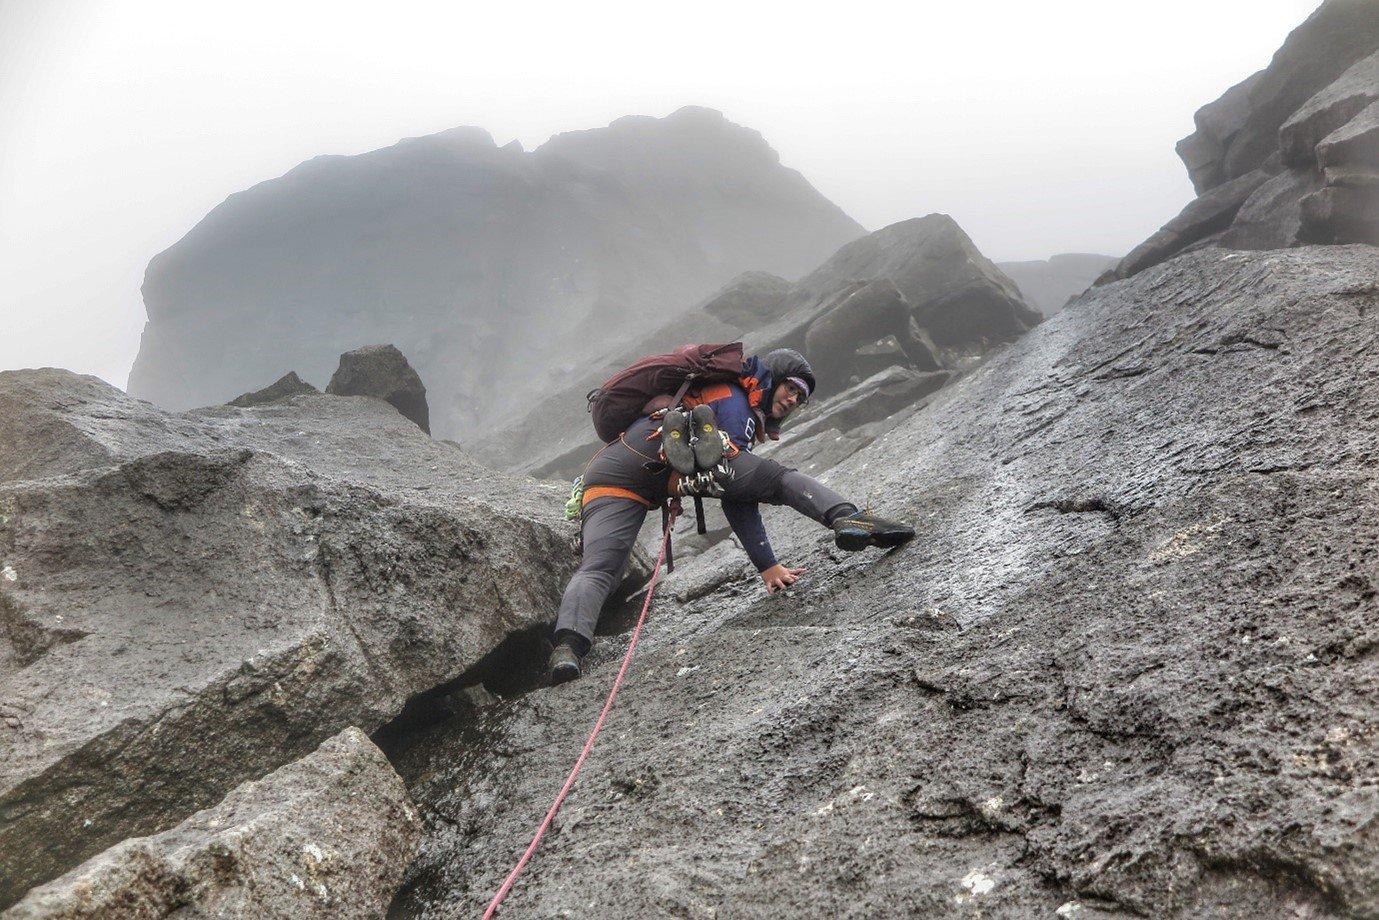 Anna climbing steep rock in Berghaus waterproof clothing